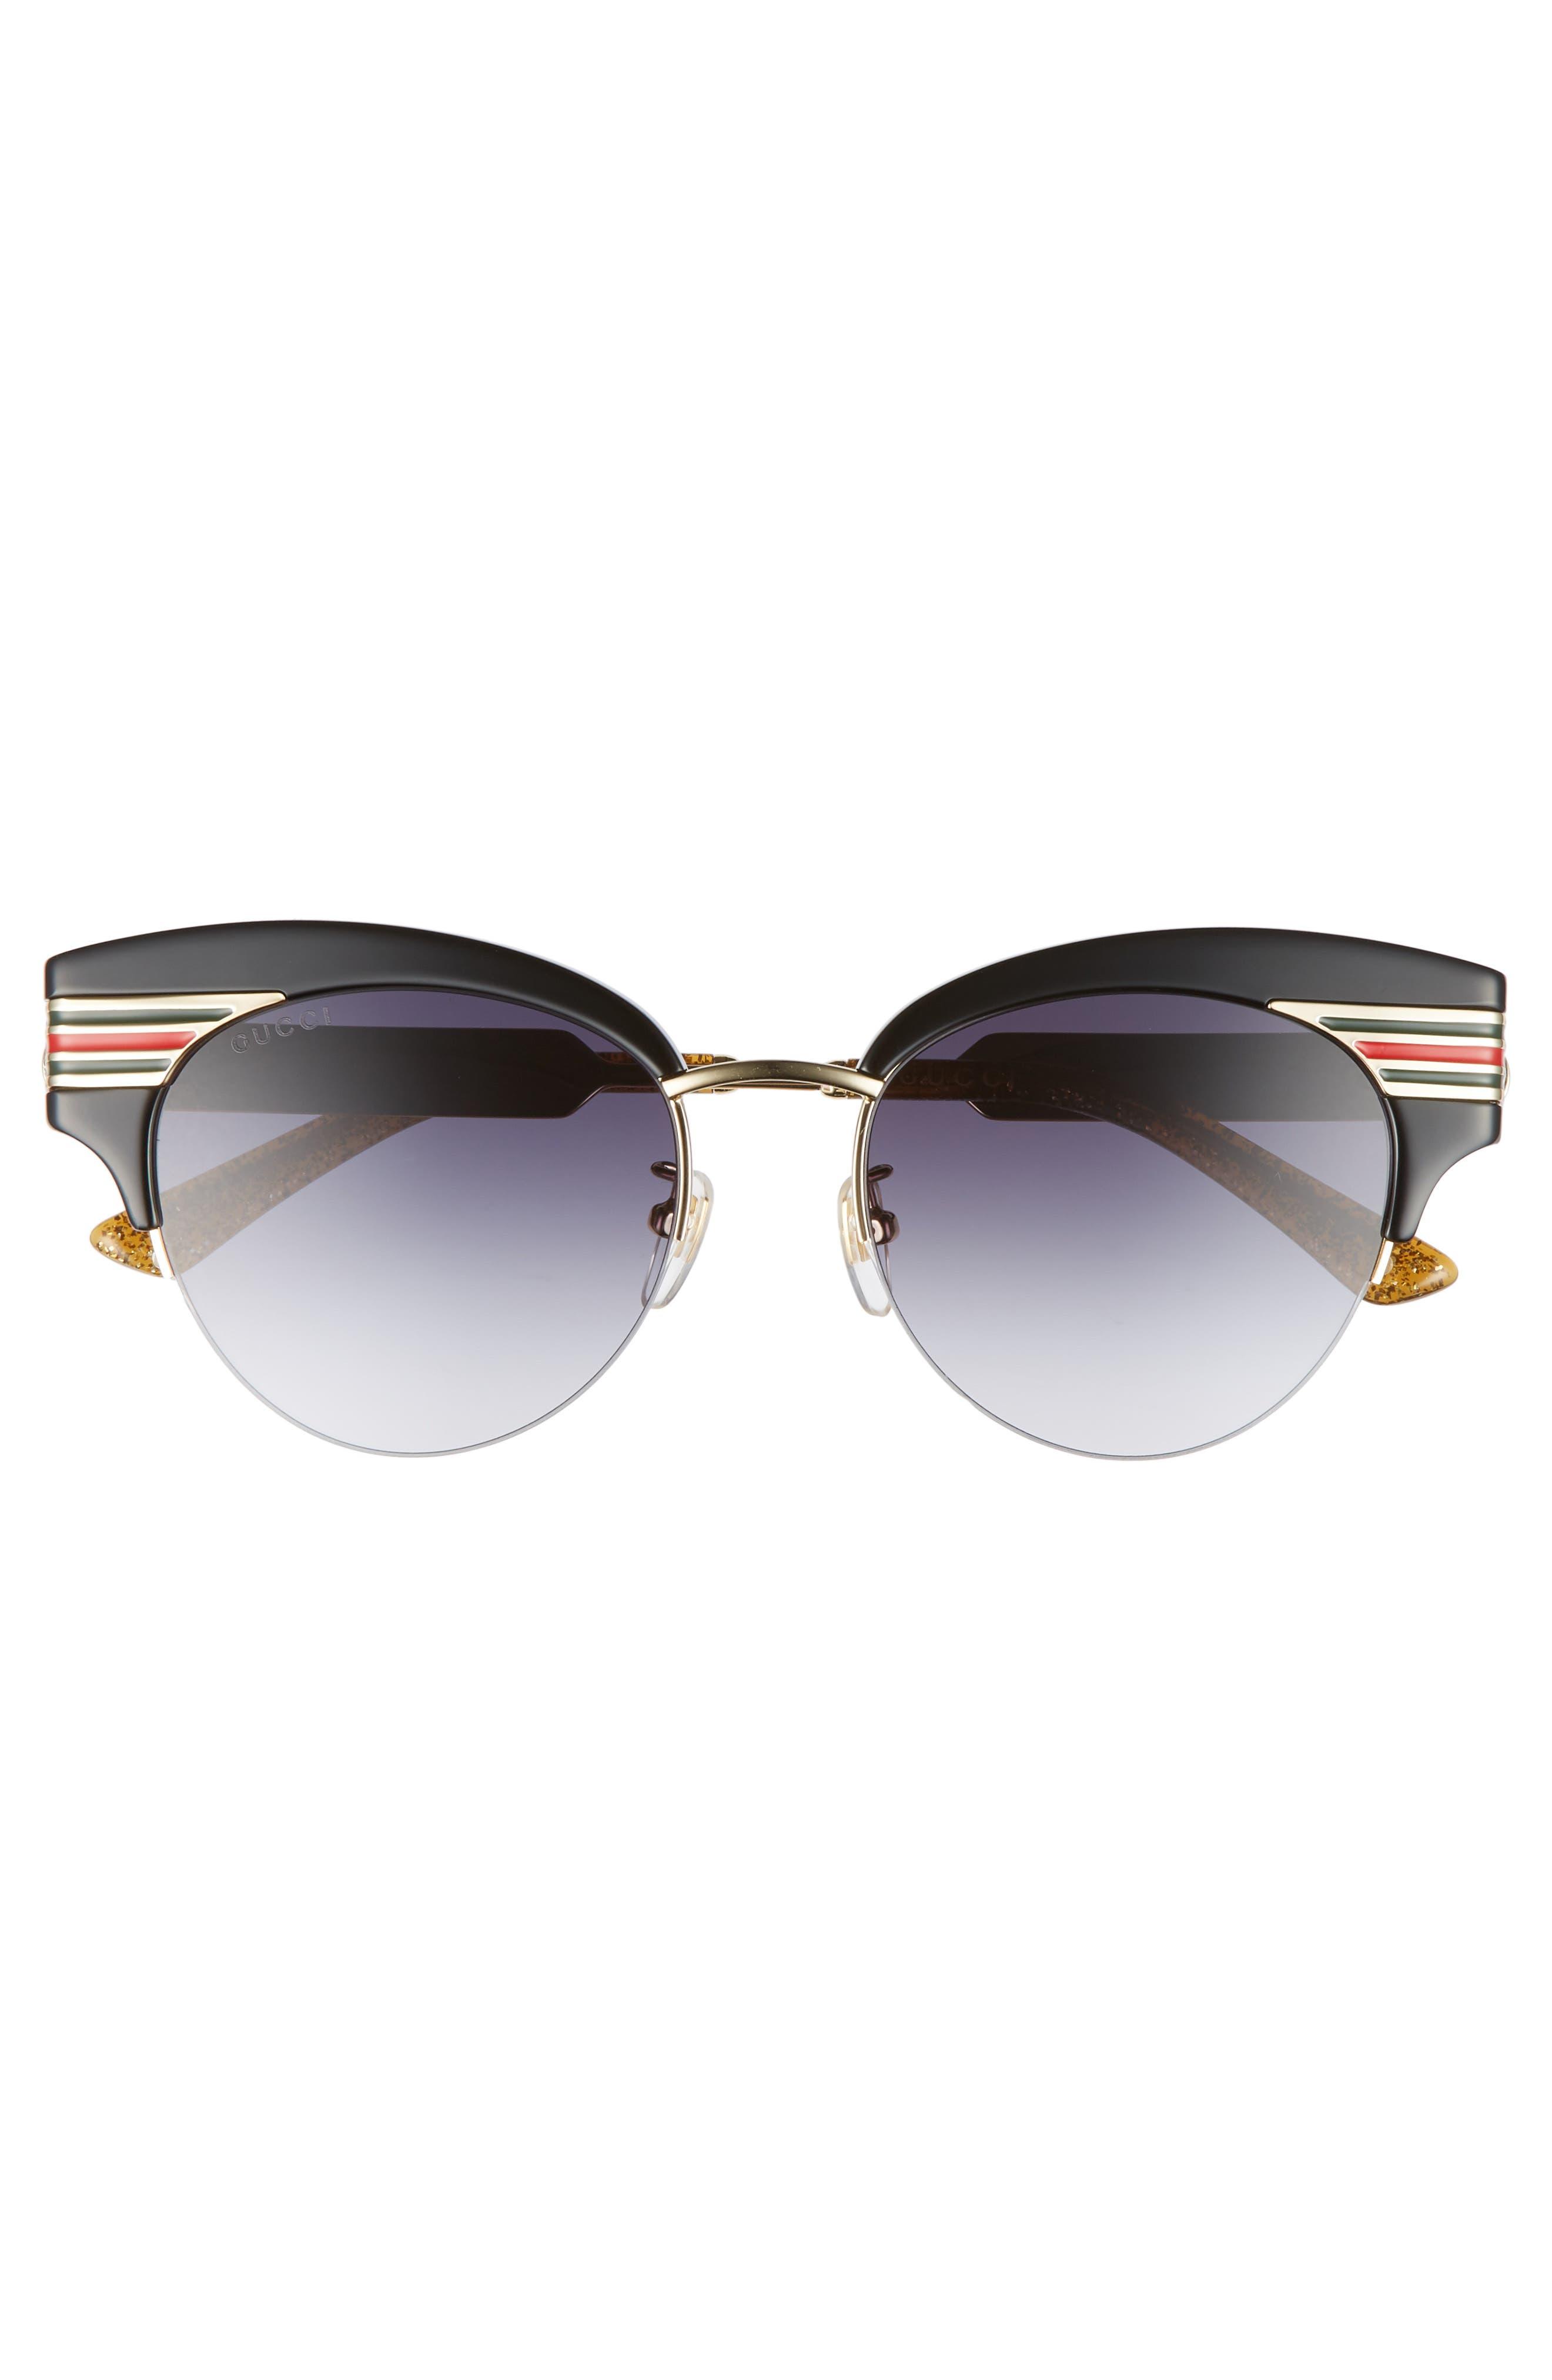 GUCCI, 53mm Cat Eye Sunglasses, Alternate thumbnail 3, color, GOLD